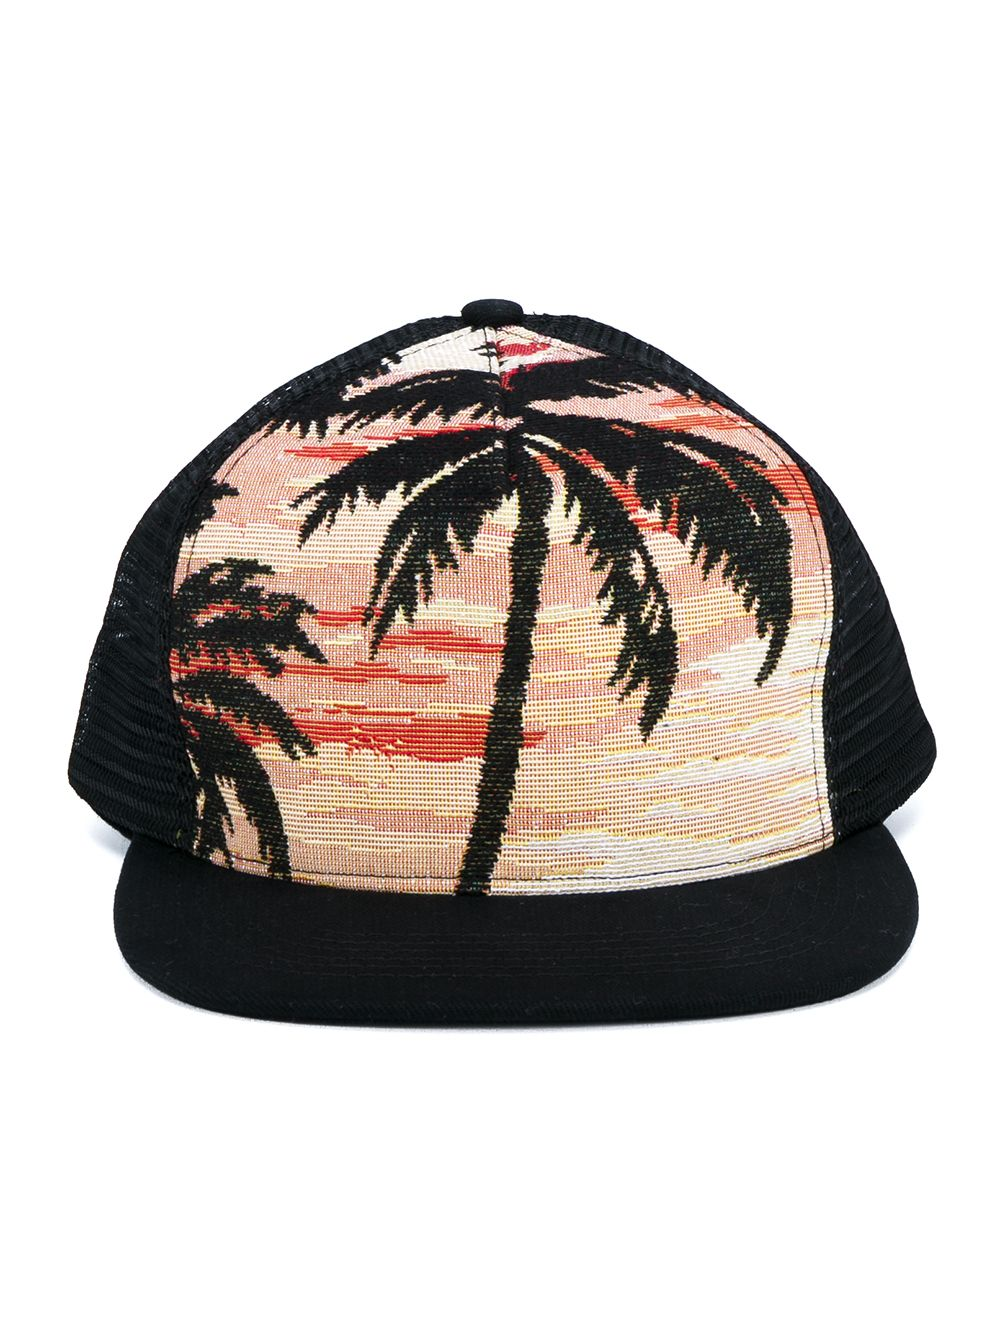 d71afb7e50a Saint Laurent Trucker Hat Palms At Sunset Baseball Cap